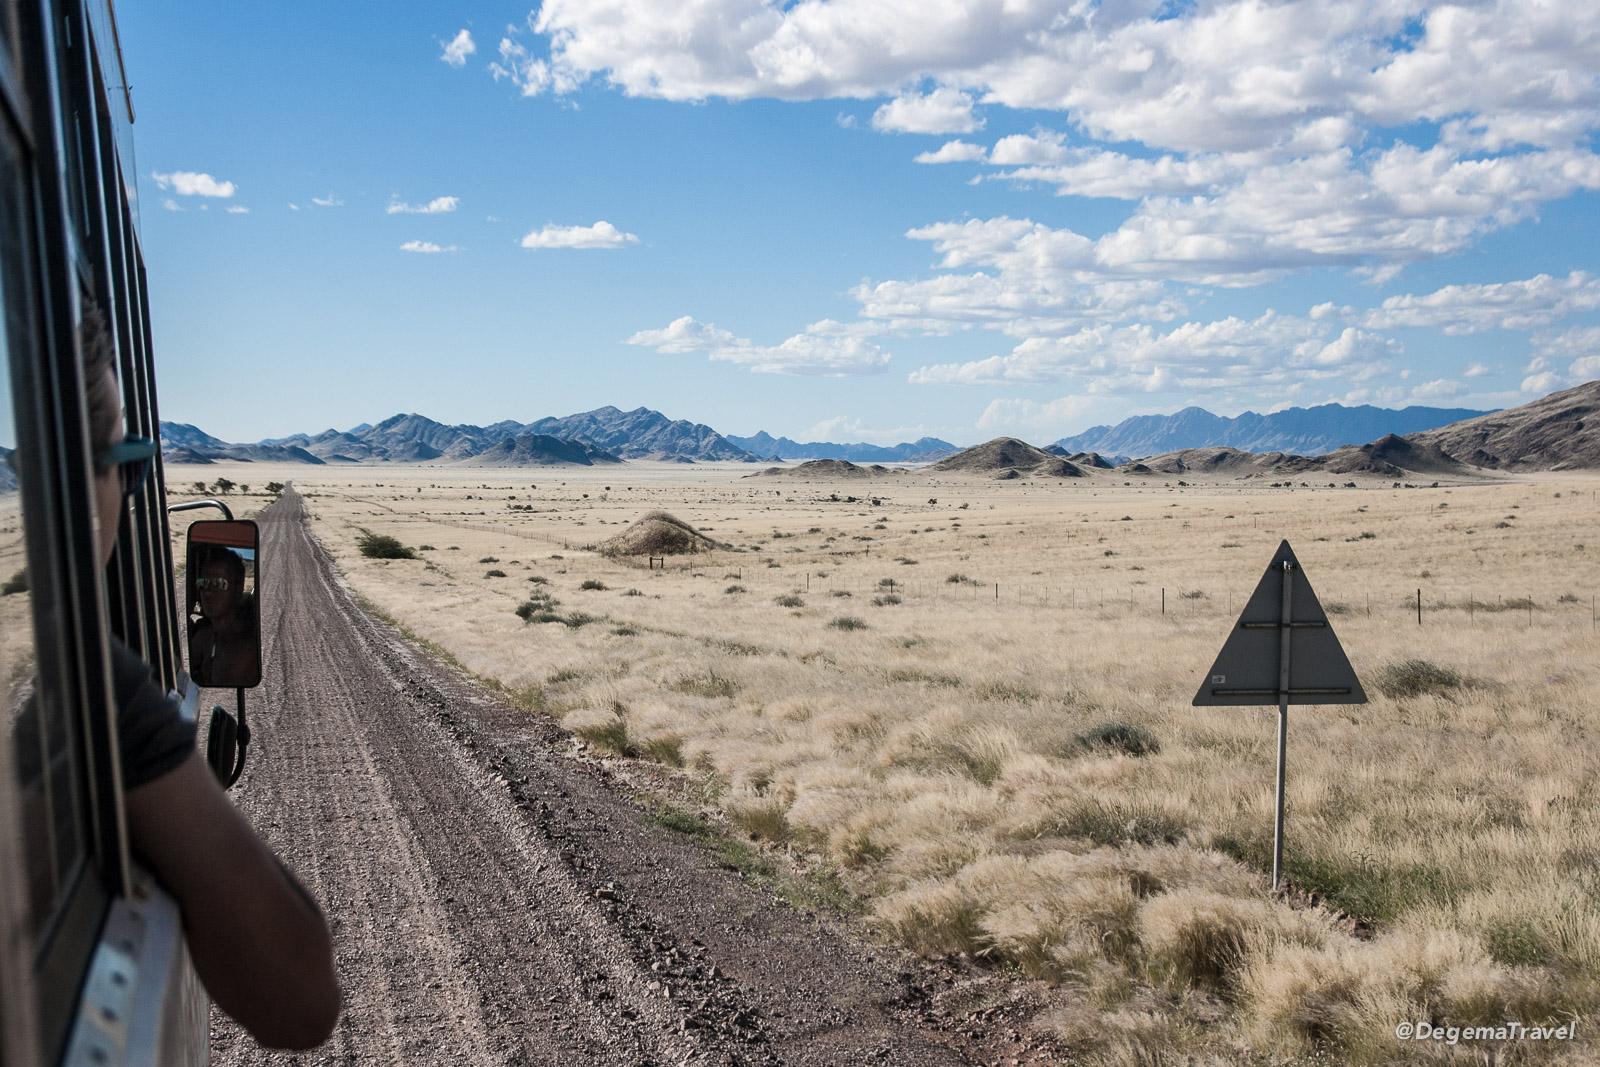 On the road towards Sesriem, Namibia, aboard Helena - the Dragoman truck